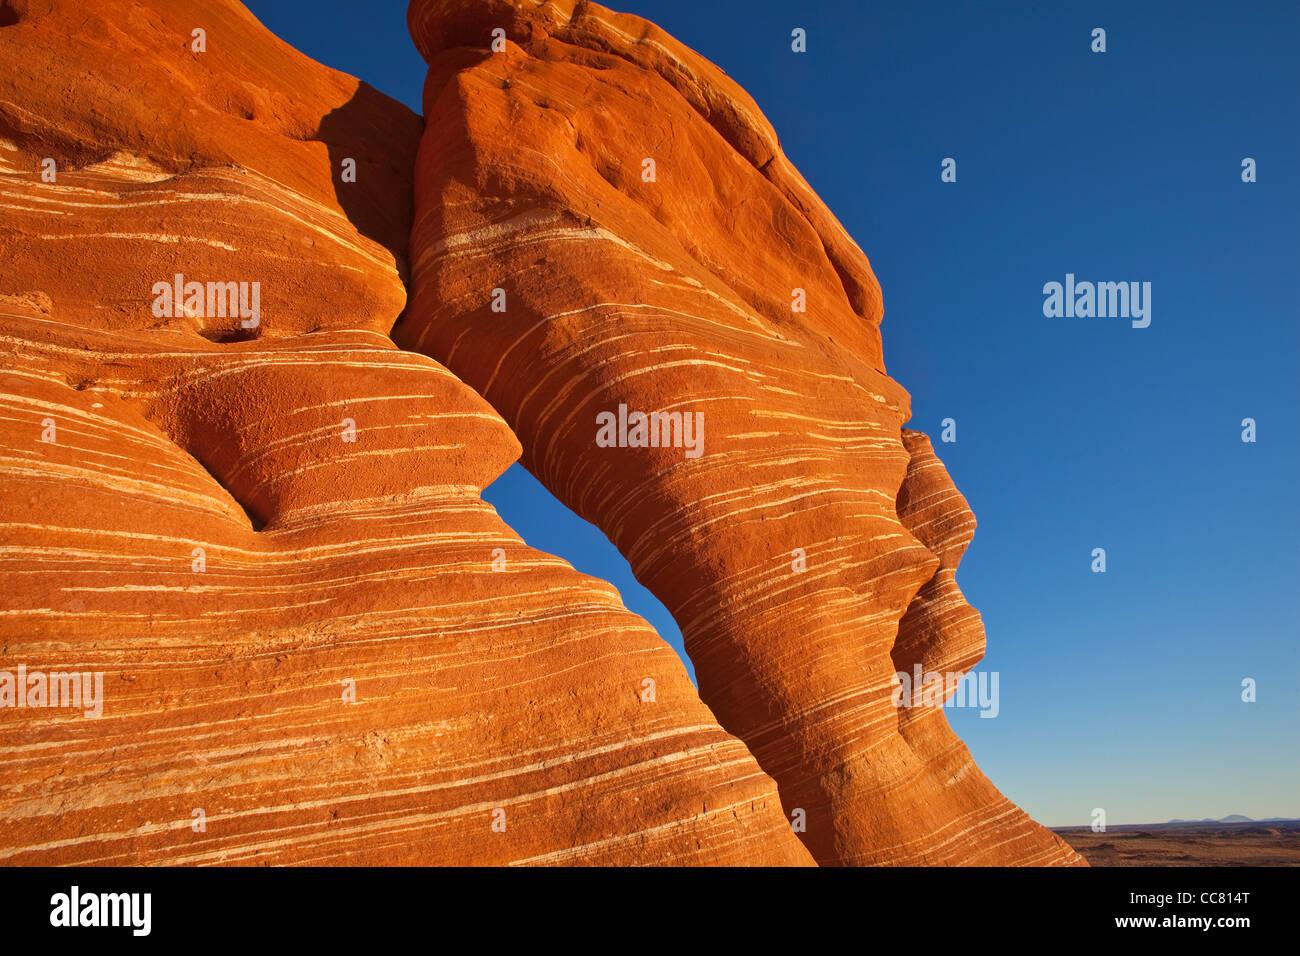 Sandstein, Hoodoos, Felsformationen, Ward Terrasse, Navajo Nation, Coconino County, Arizona, USA Stockfoto